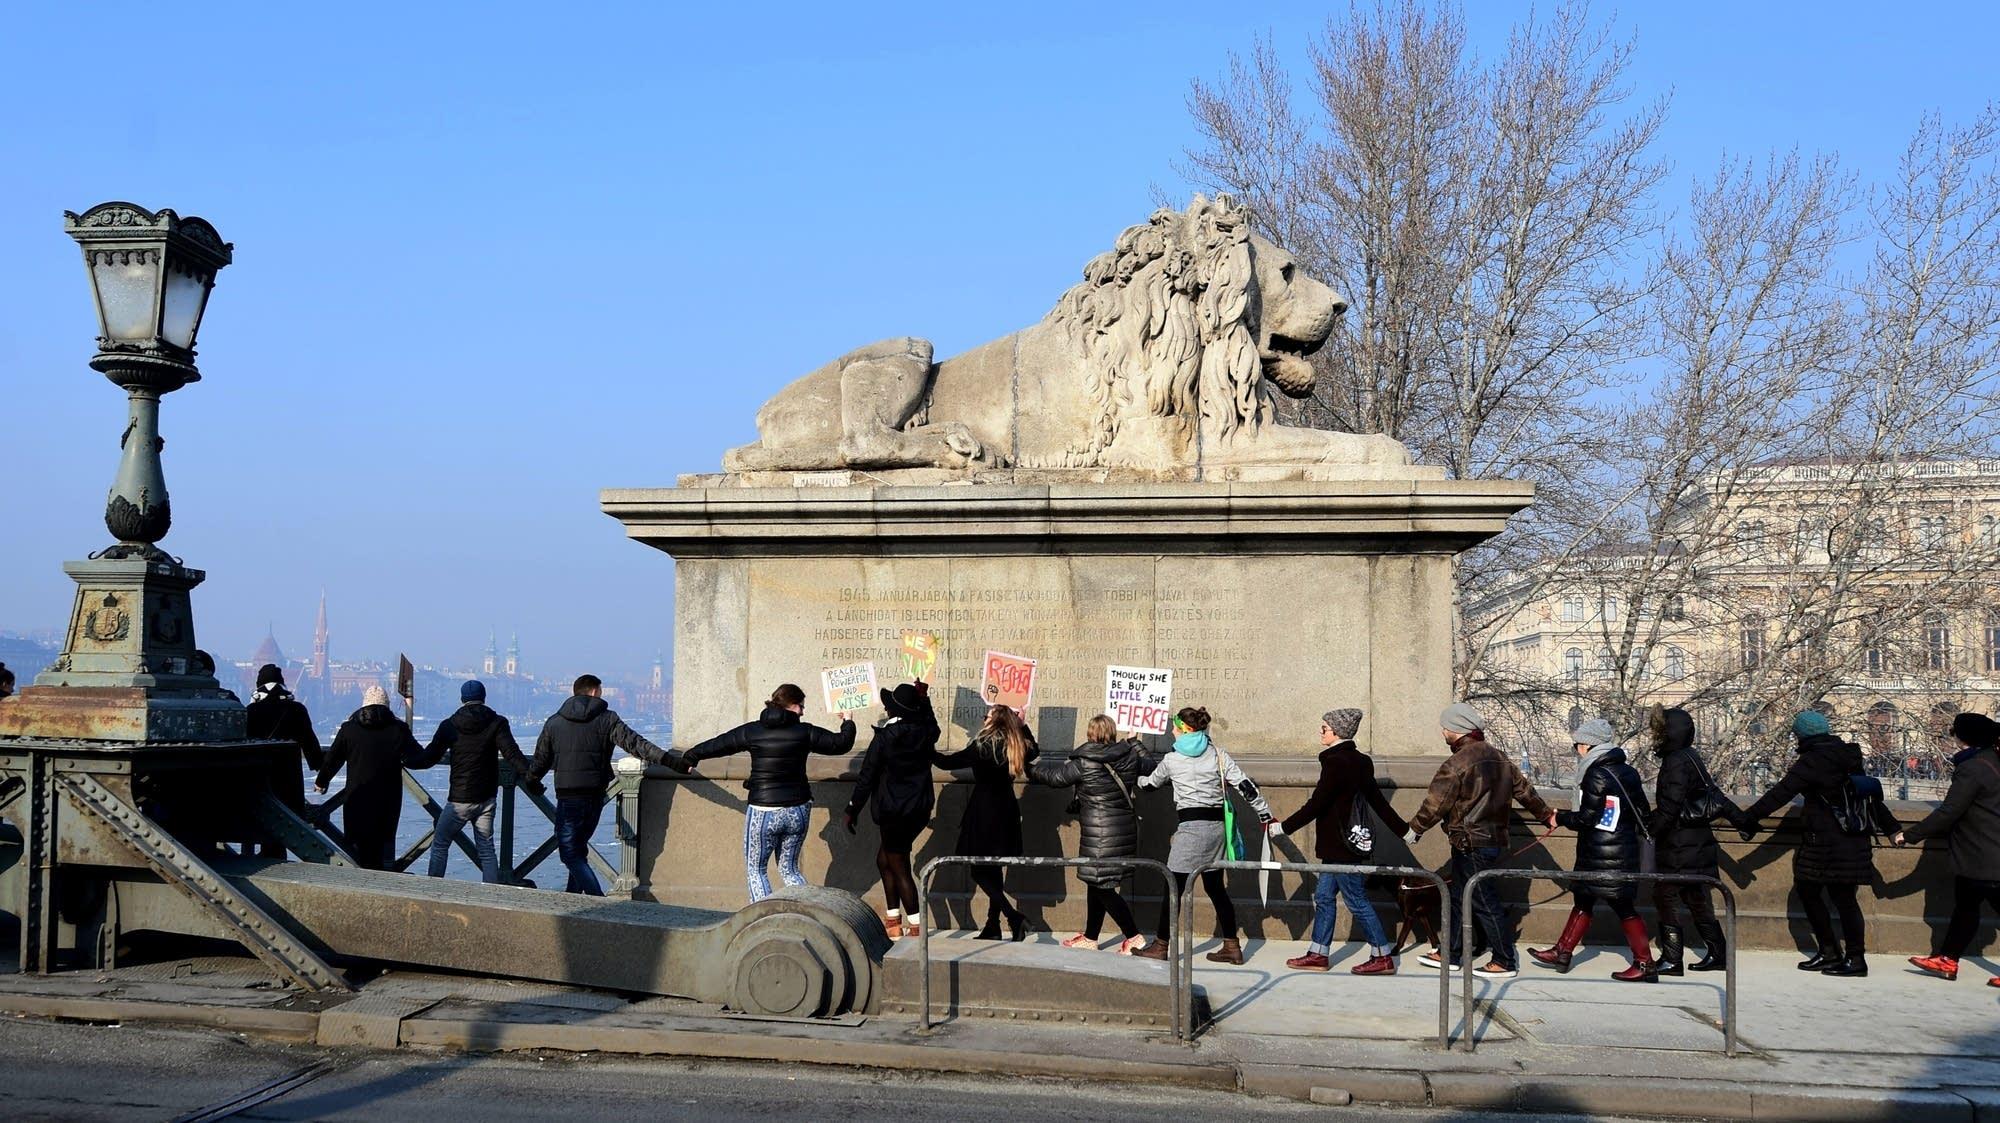 Budapest, Hungary: Participants create a human chain.